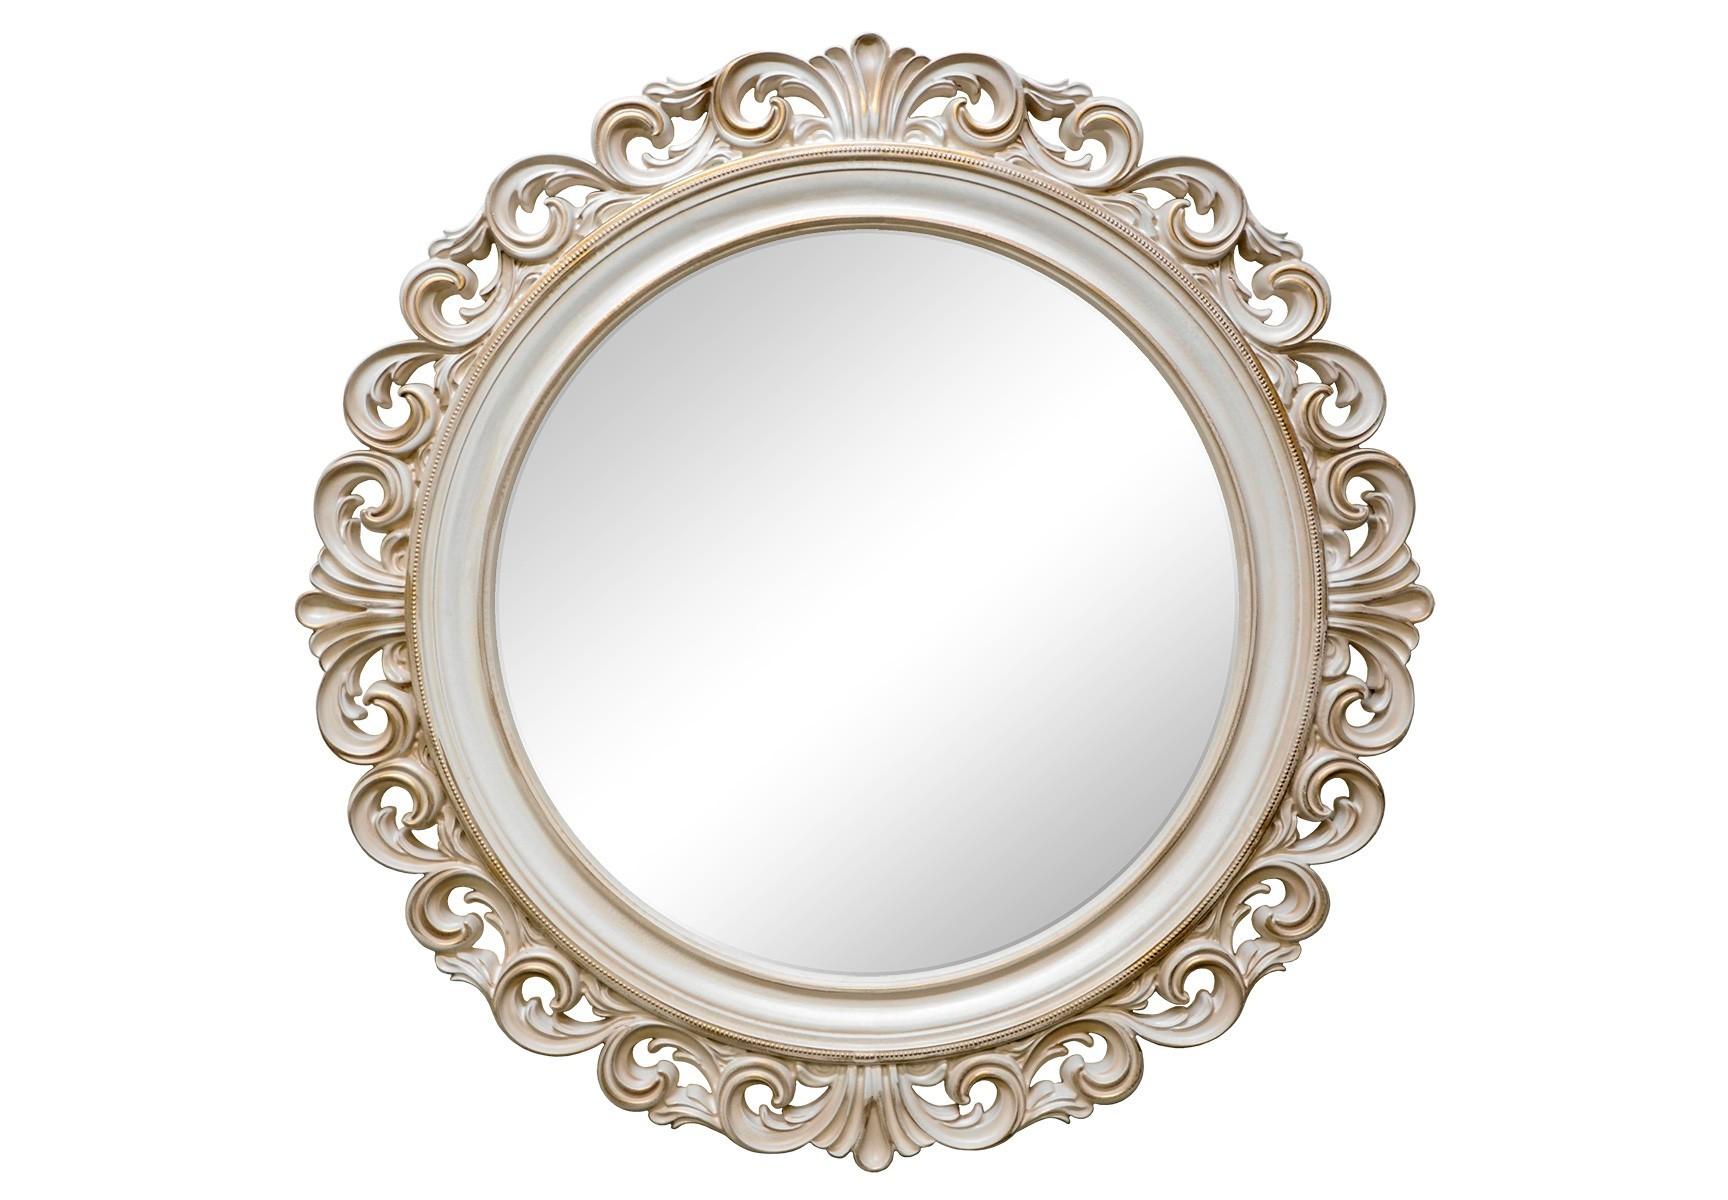 Зеркало РИКИОЛИНастенные зеркала<br><br><br>Material: Стекло<br>Глубина см: 4